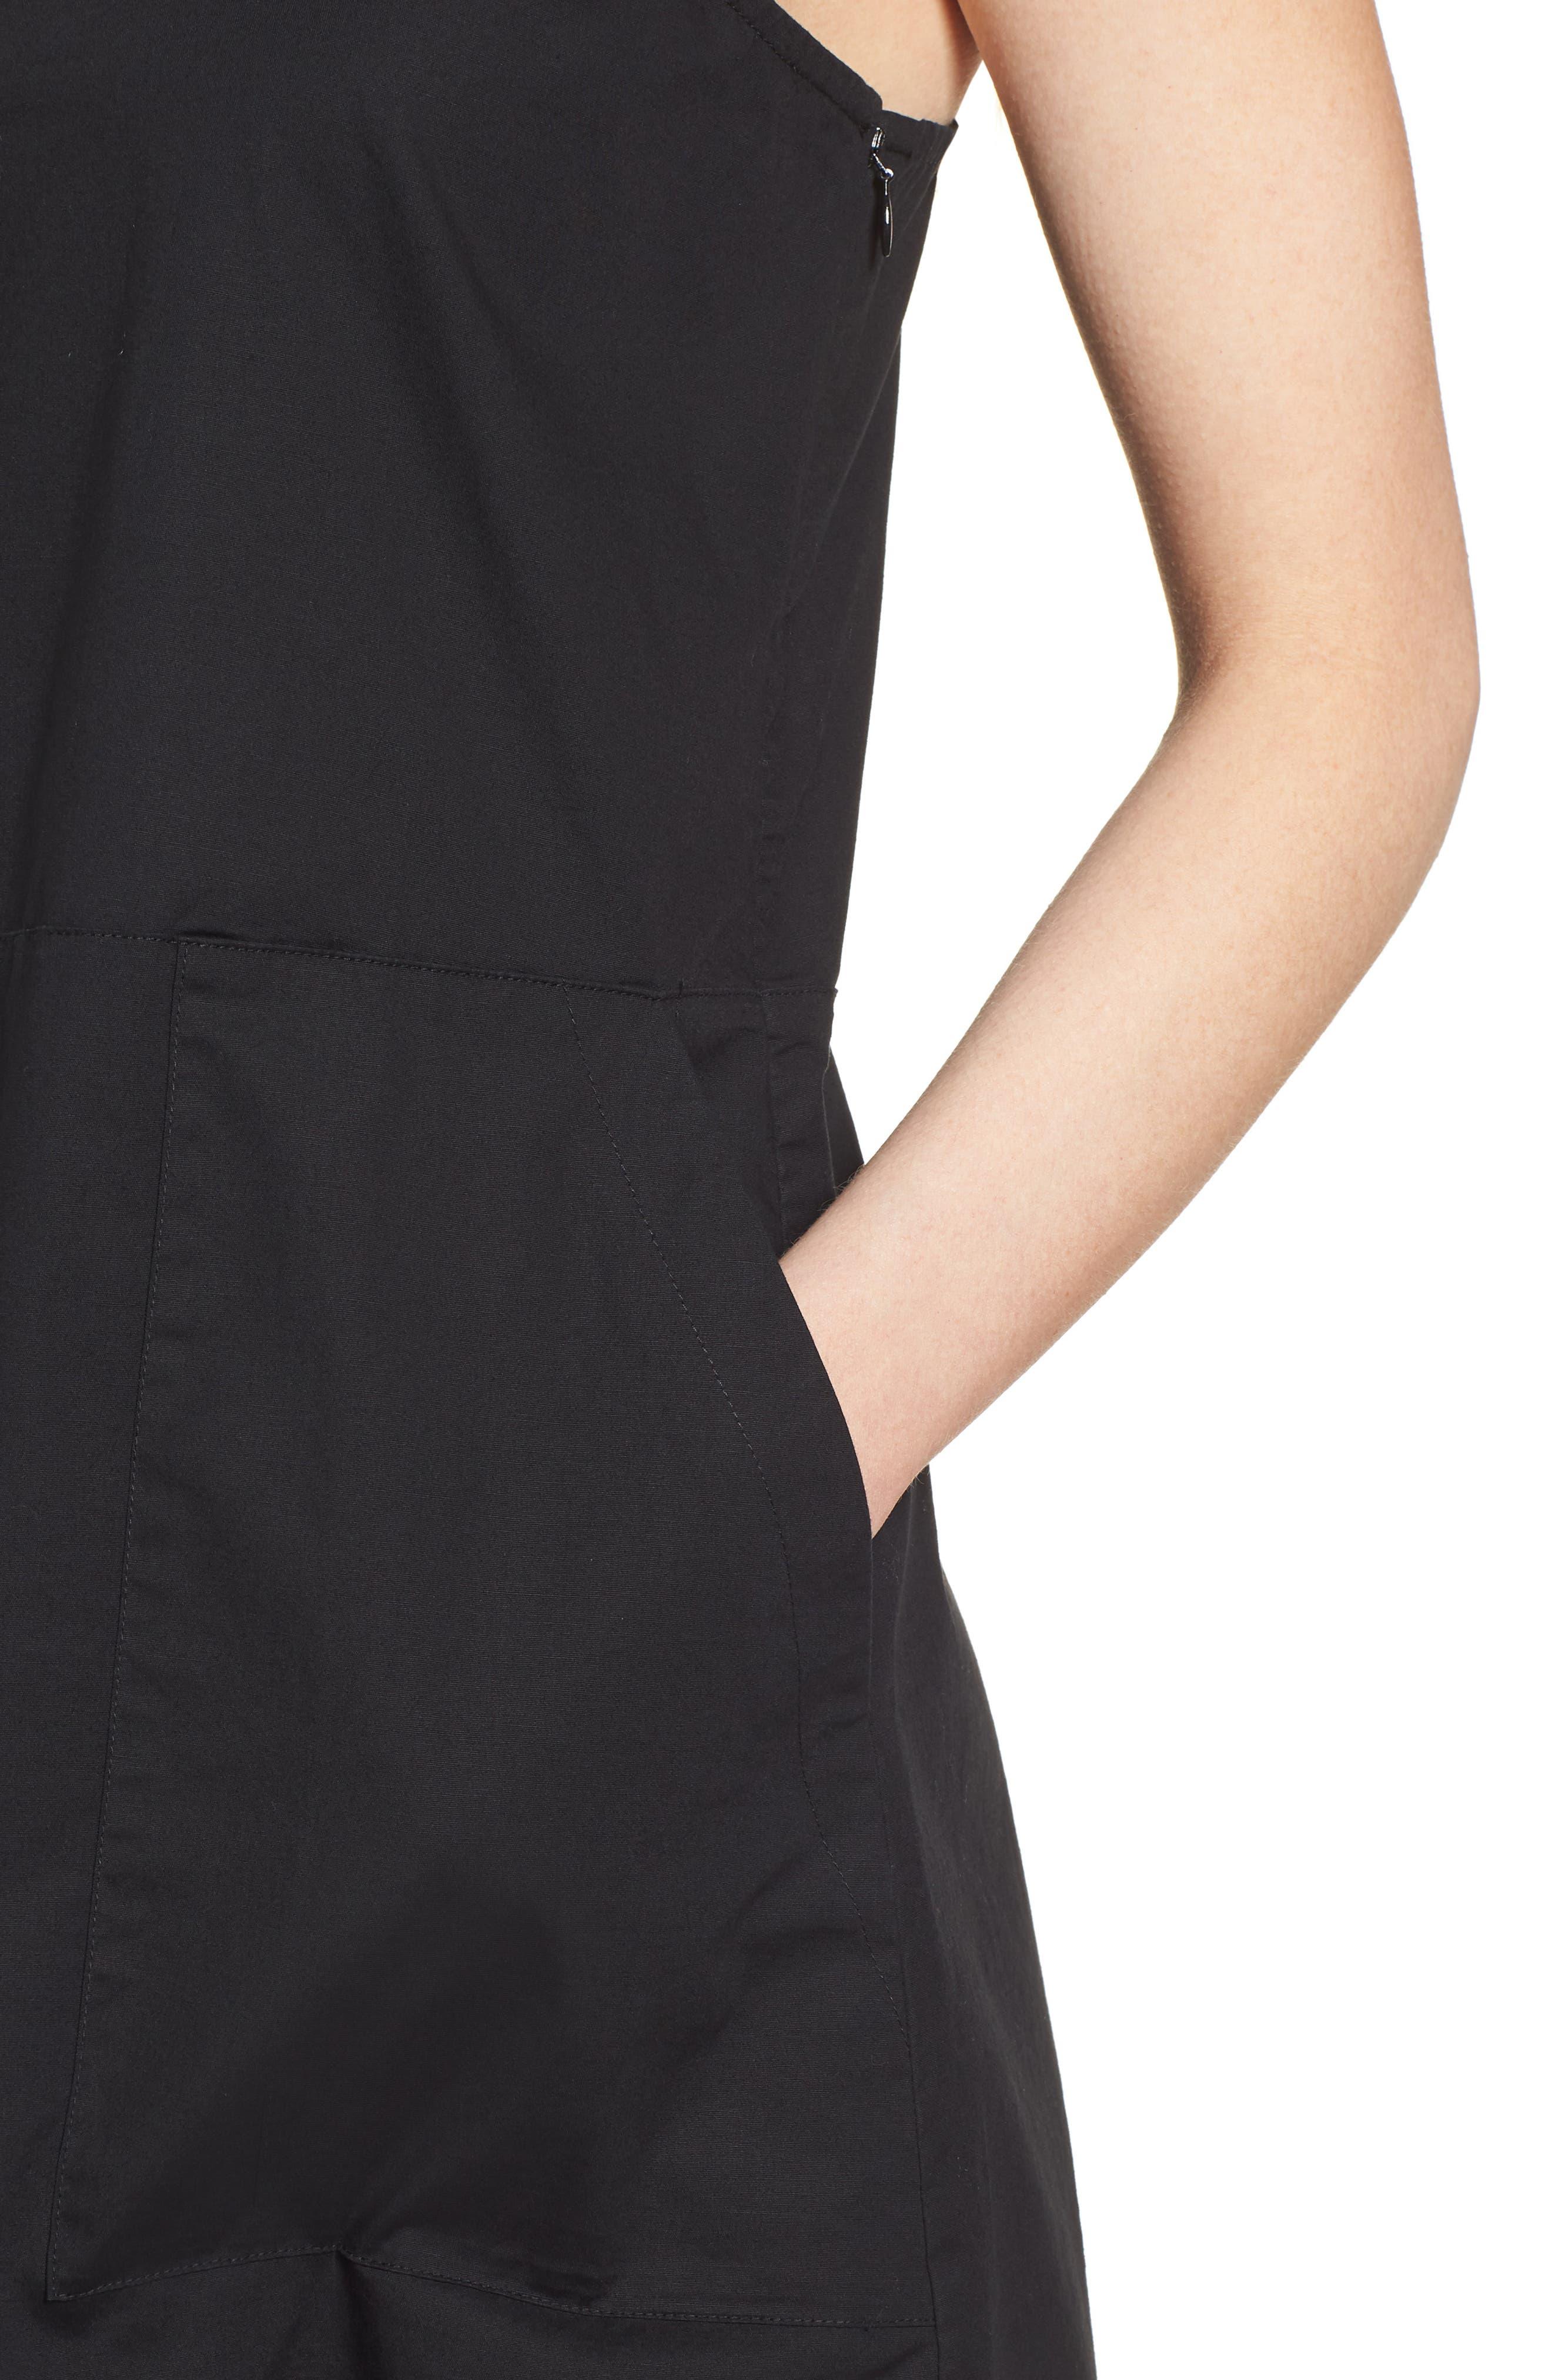 Stretch Organic Cotton Tank Dress,                             Alternate thumbnail 4, color,                             Black